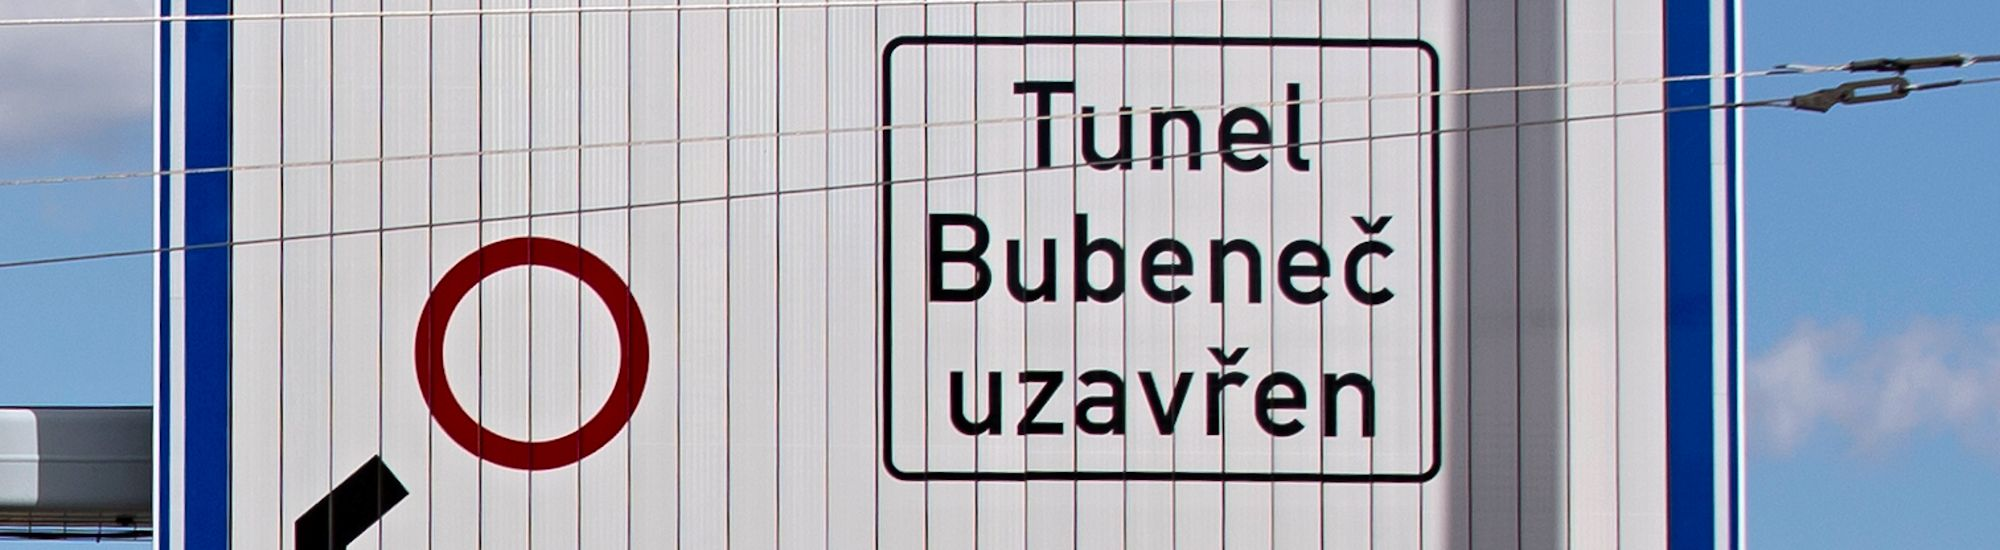 Uzávěra Bubenečského tunelu 18.3.-19.3.2017